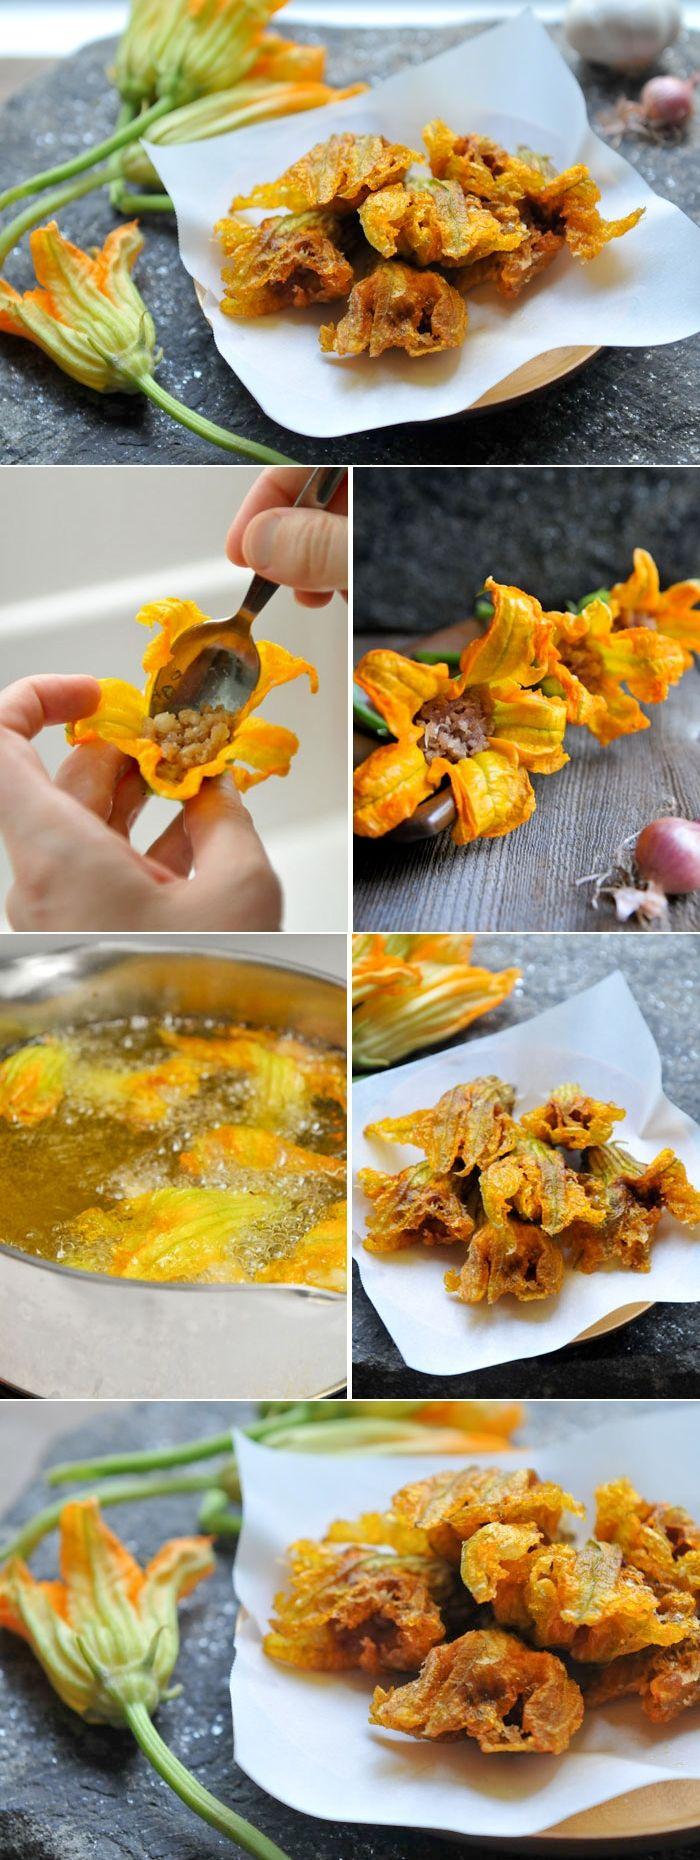 Pork-Stuffed Squash Blossoms | Dawg Fugtong Tod | ดอกฟักทองทอด